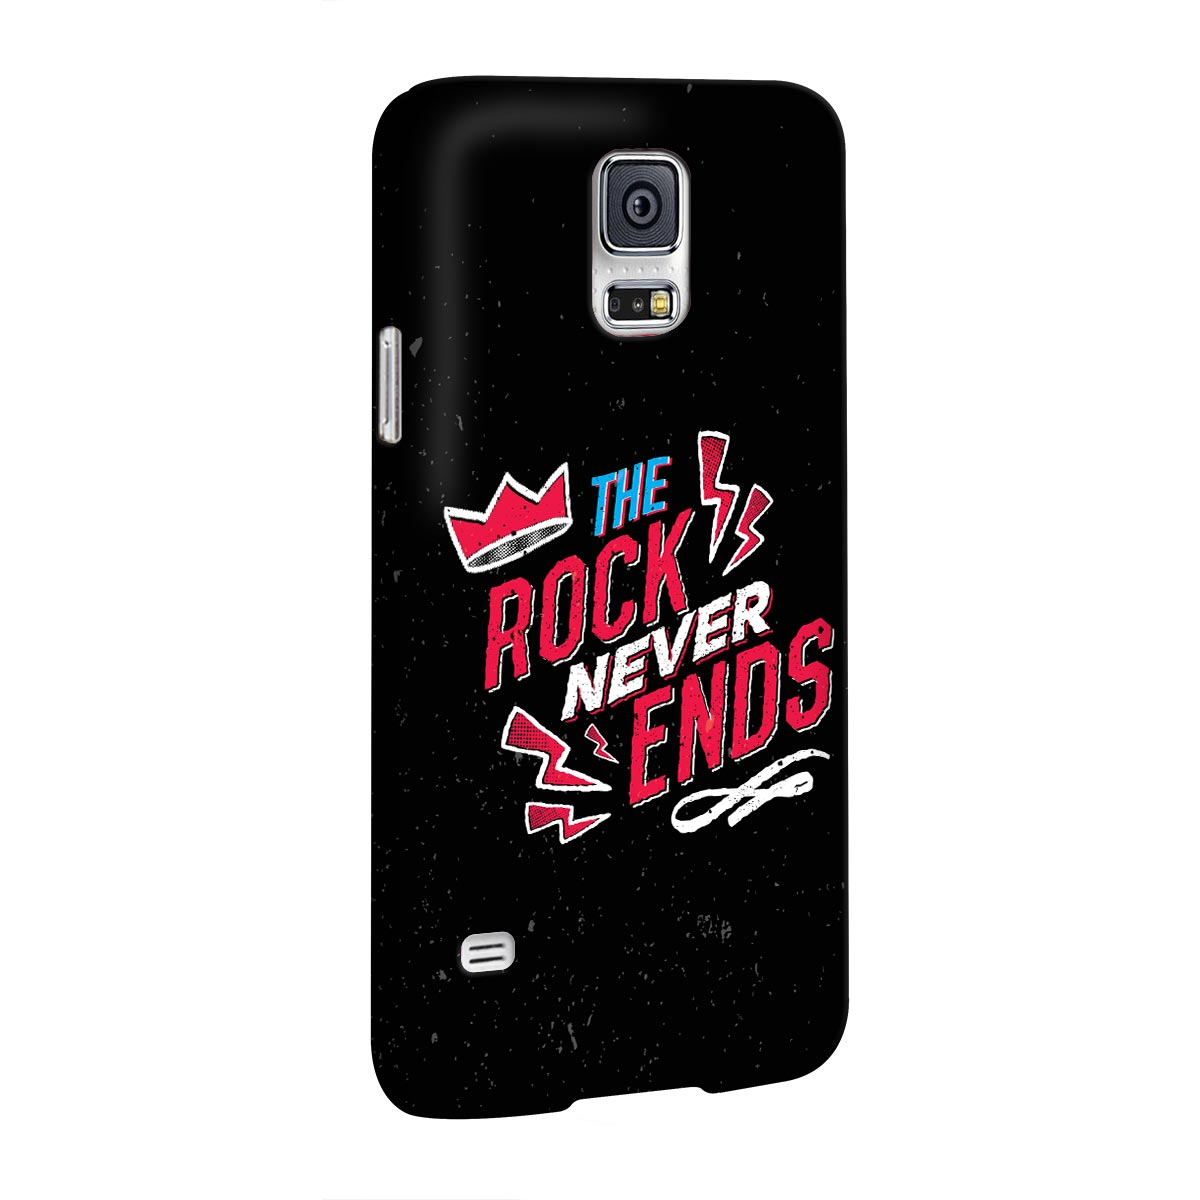 Capa para Samsung Galaxy S5 89FM A Rádio Rock 30 Anos The Rock Never Ends